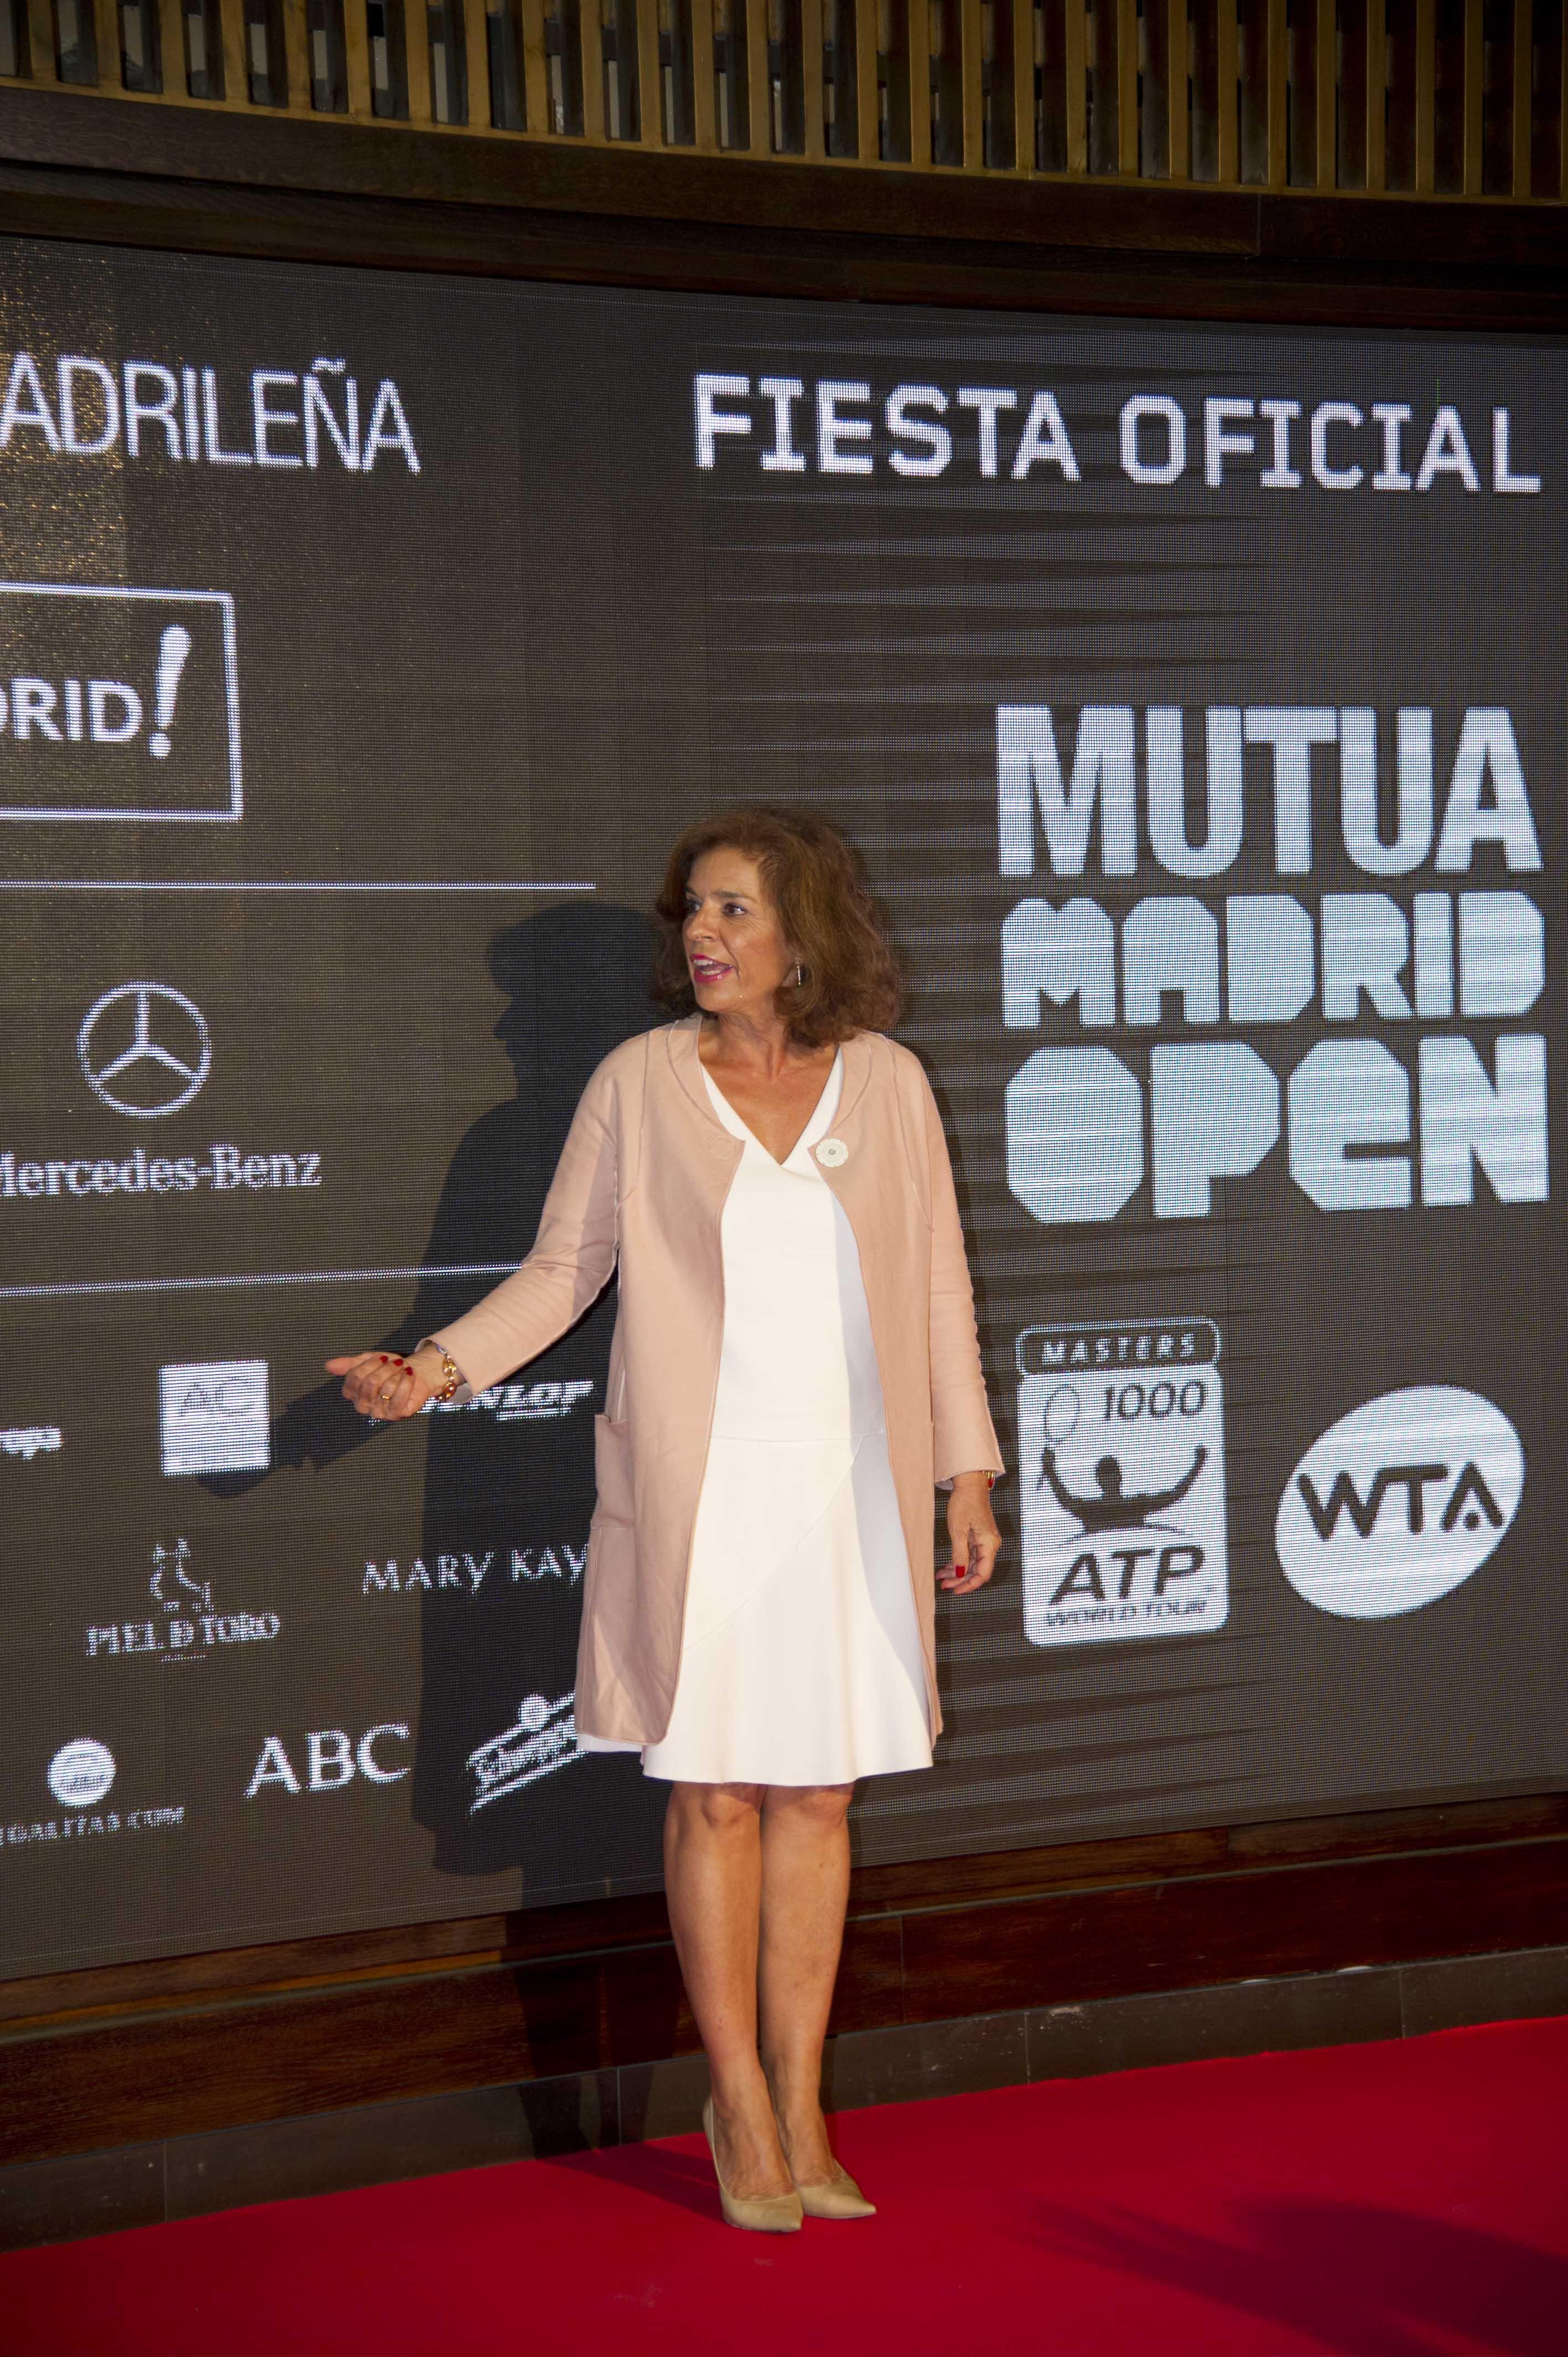 ana botella Ana botella peut désigner : ana botella serrano (née en 1954), femme politique espagnole ana botella gómez, (née en 1958), femme politique espagnole.